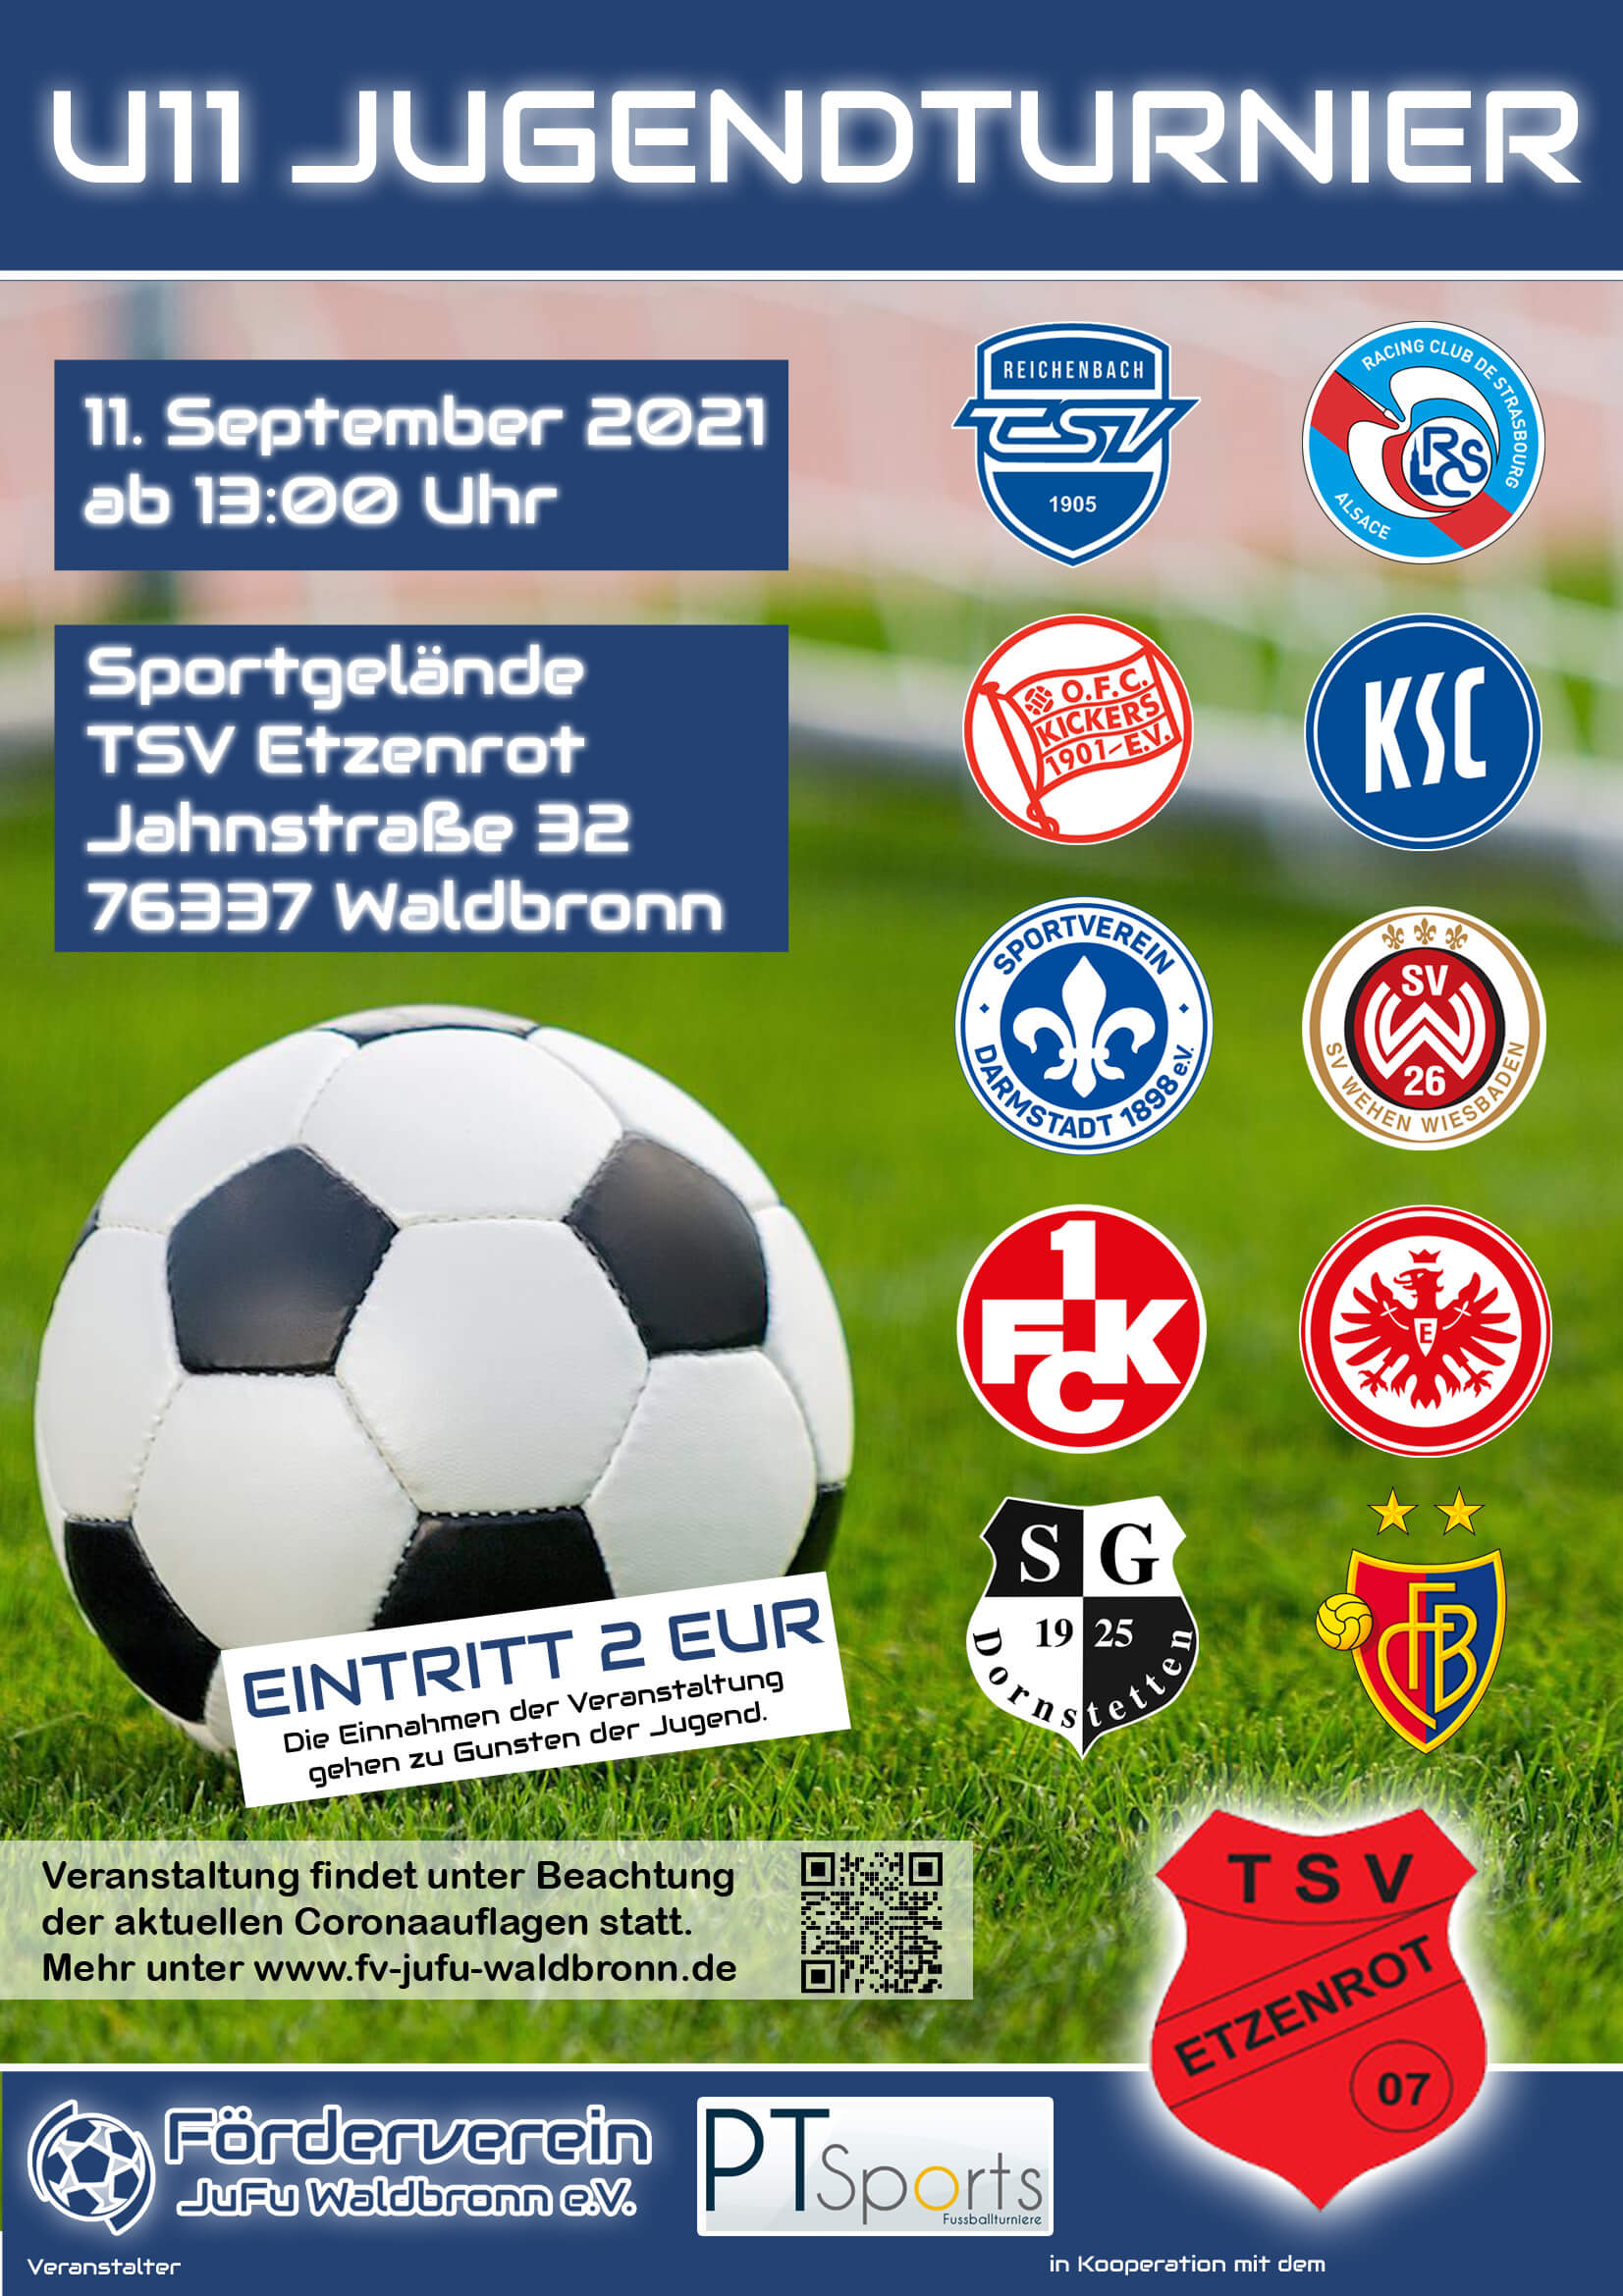 Plakat U11 Jugendtunier